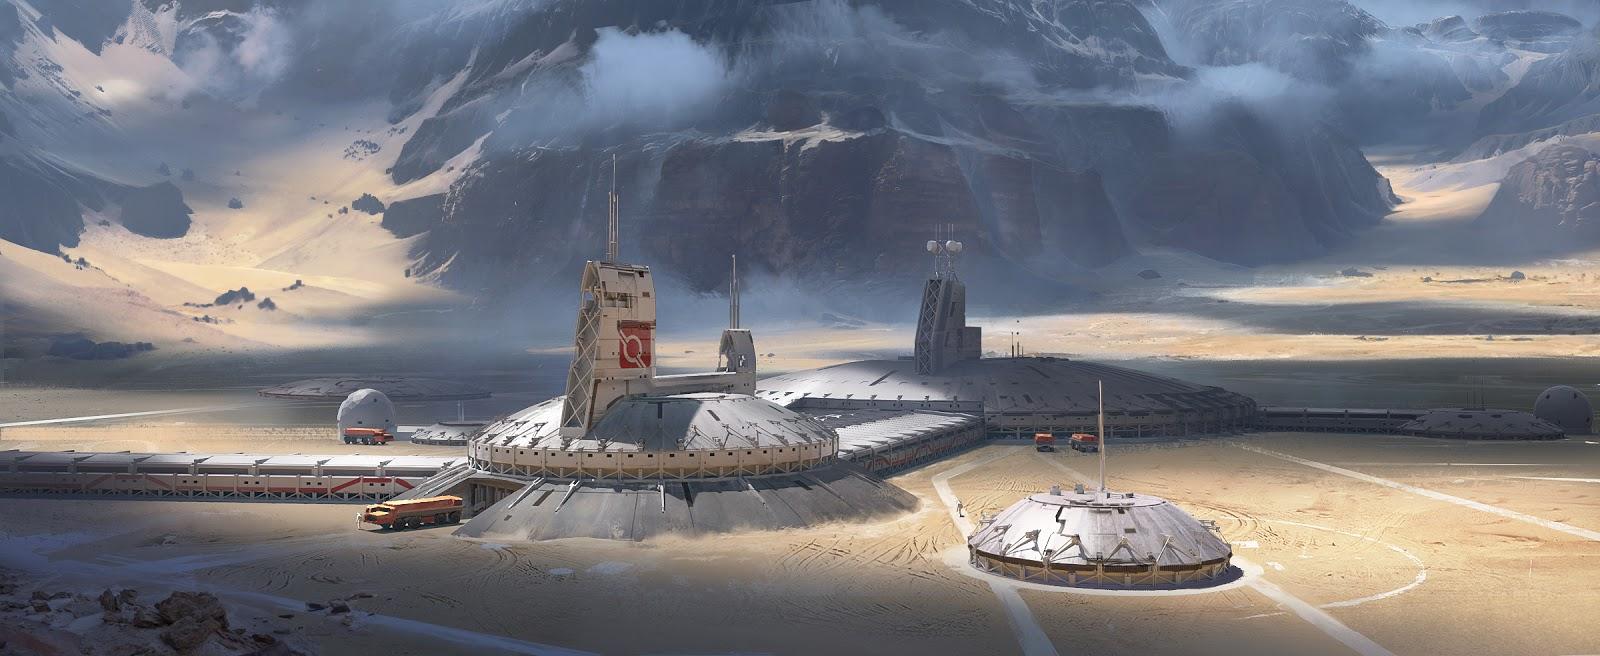 Mars colony by Erik van Helvoirt